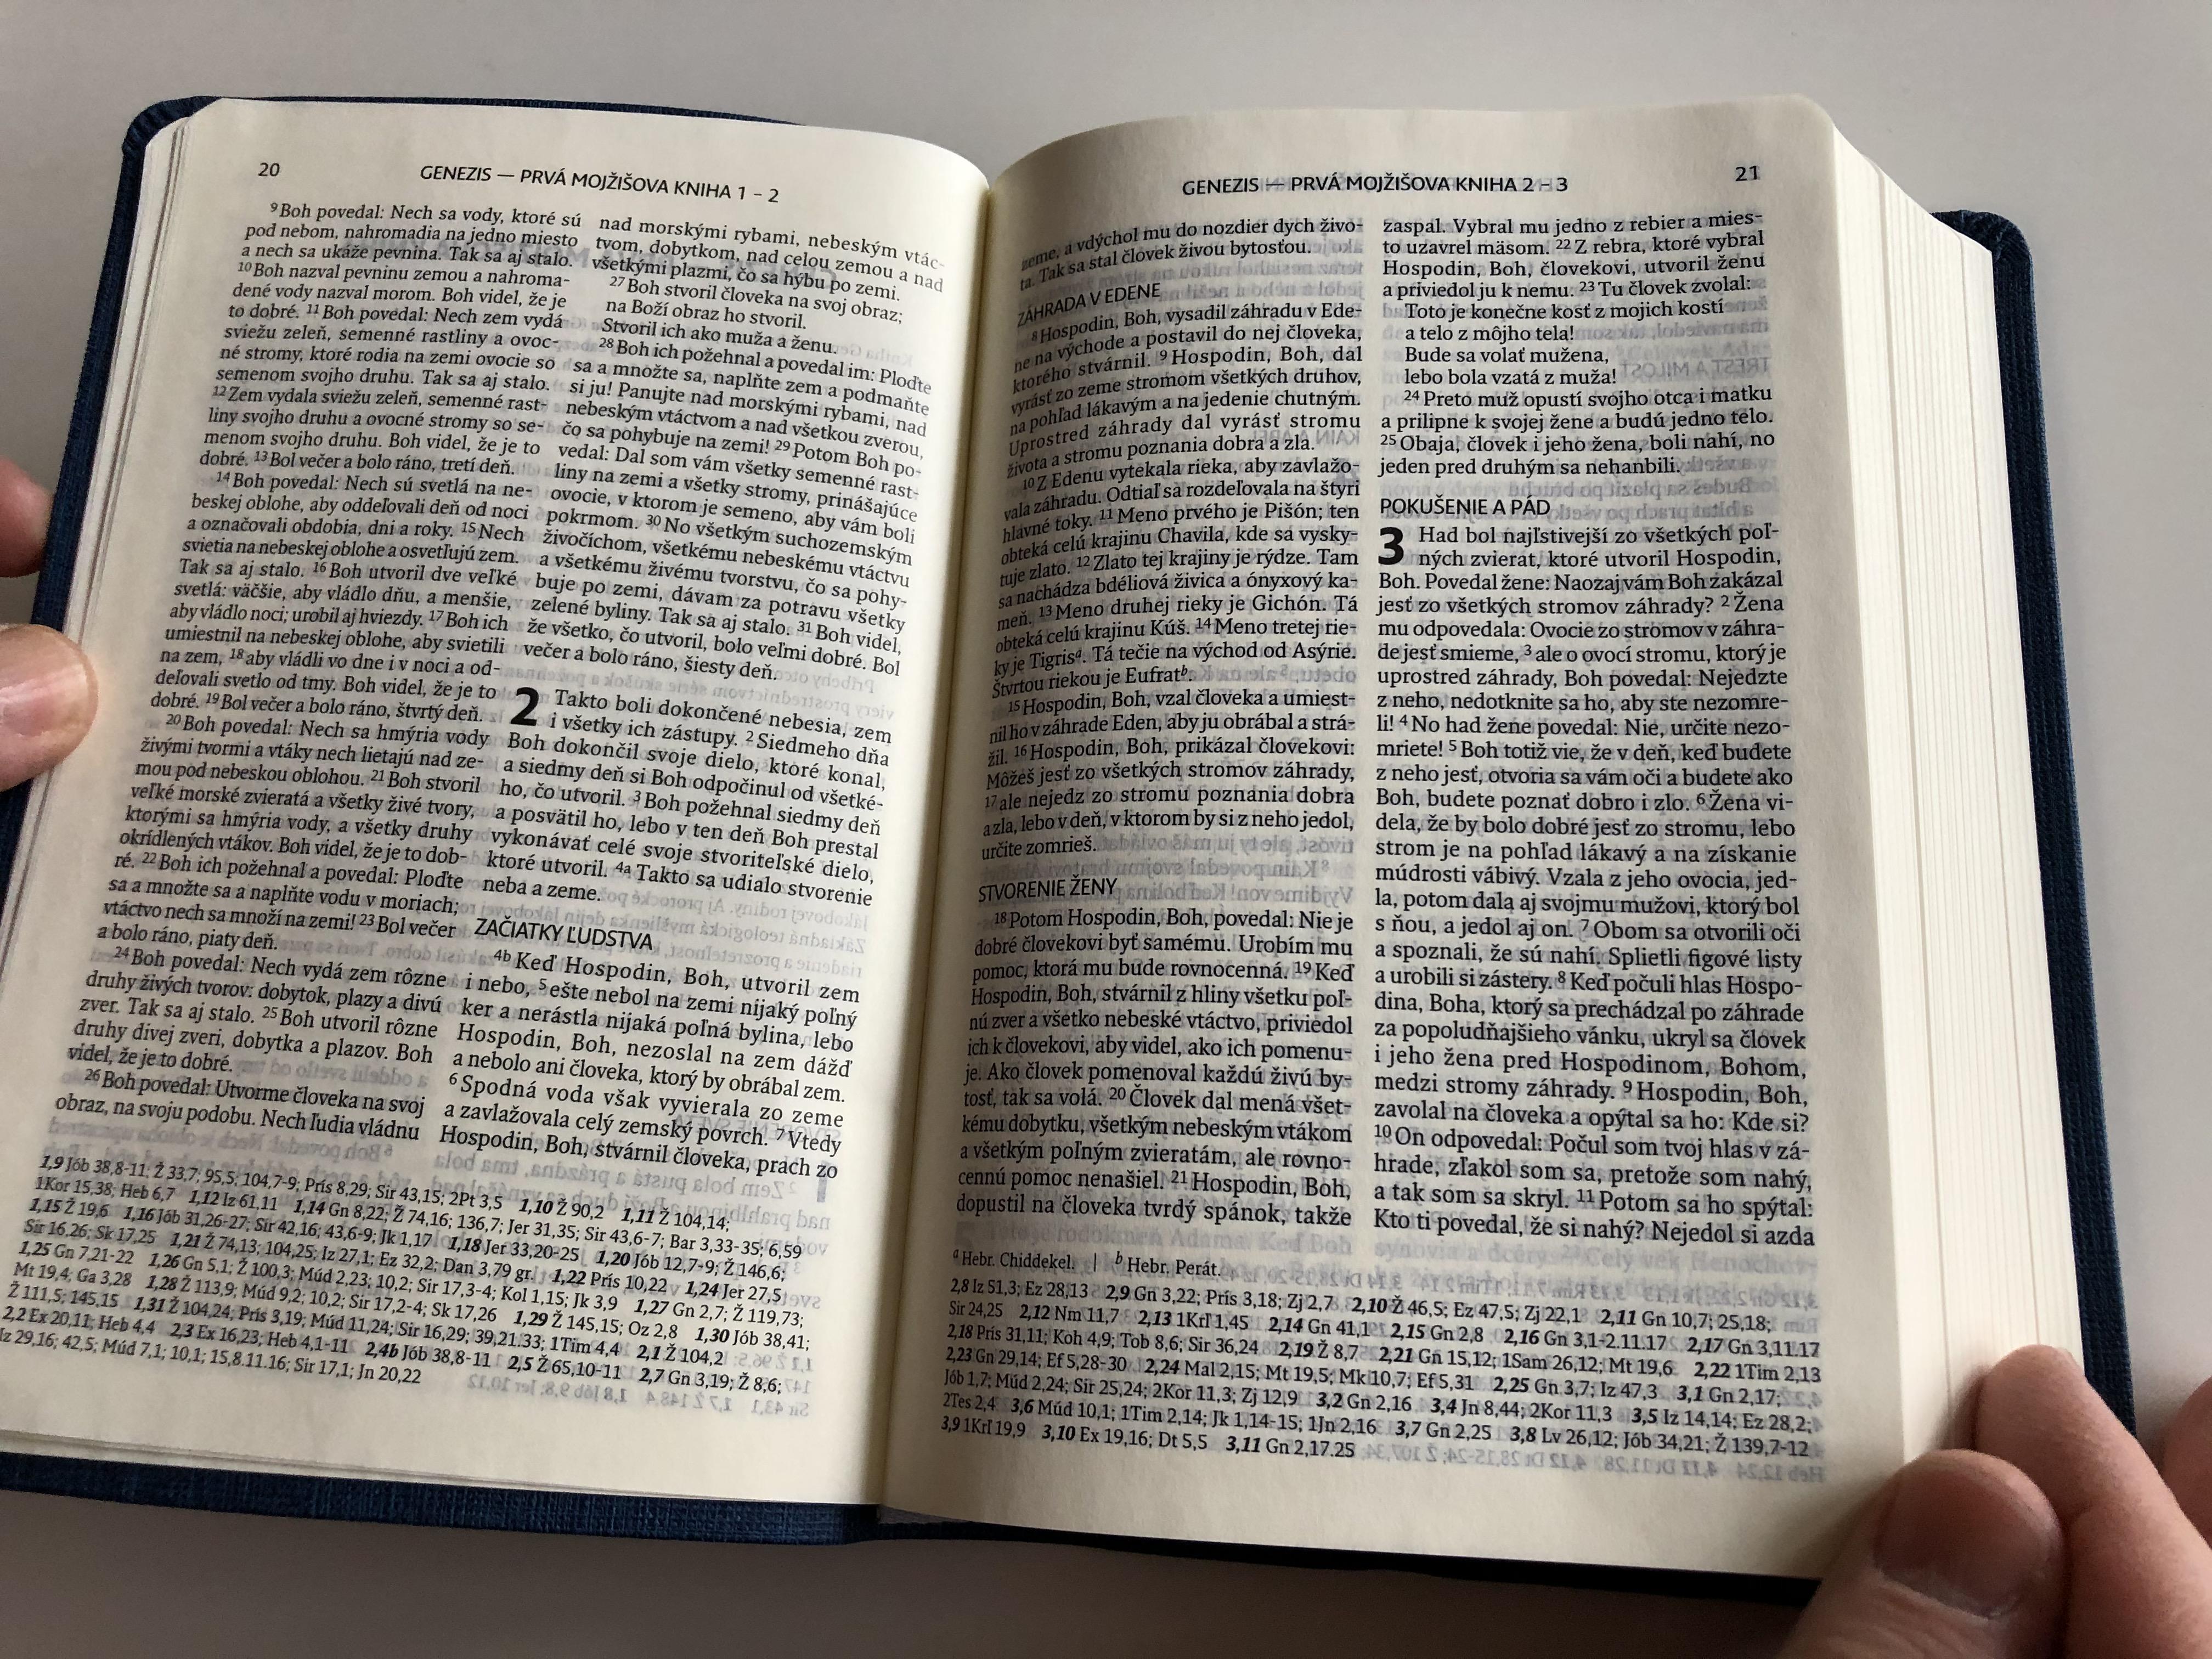 slovak-ecumenical-bible-biblia-slovensk-ekumenick-preklad-6.jpg